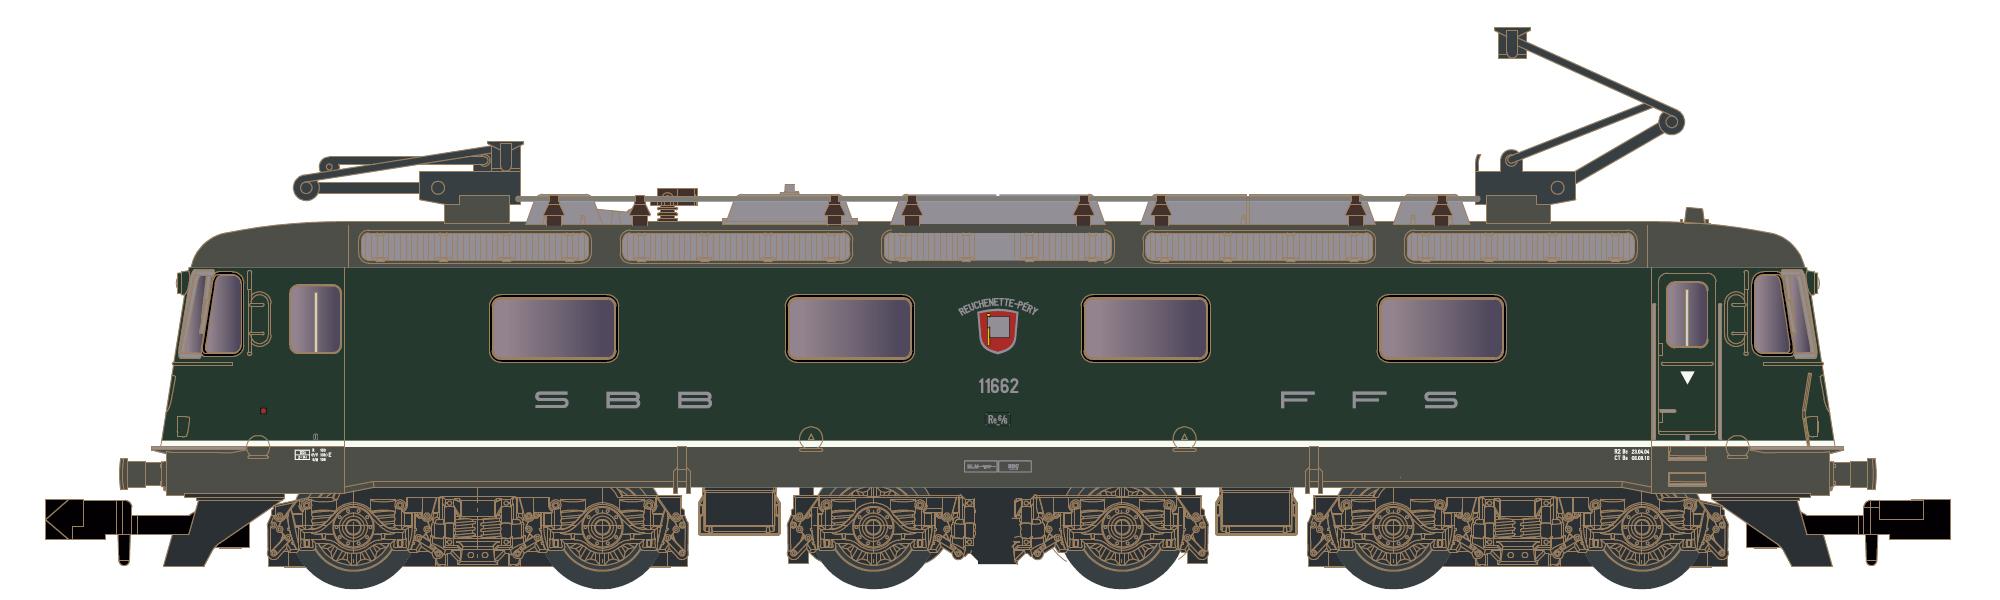 K10174